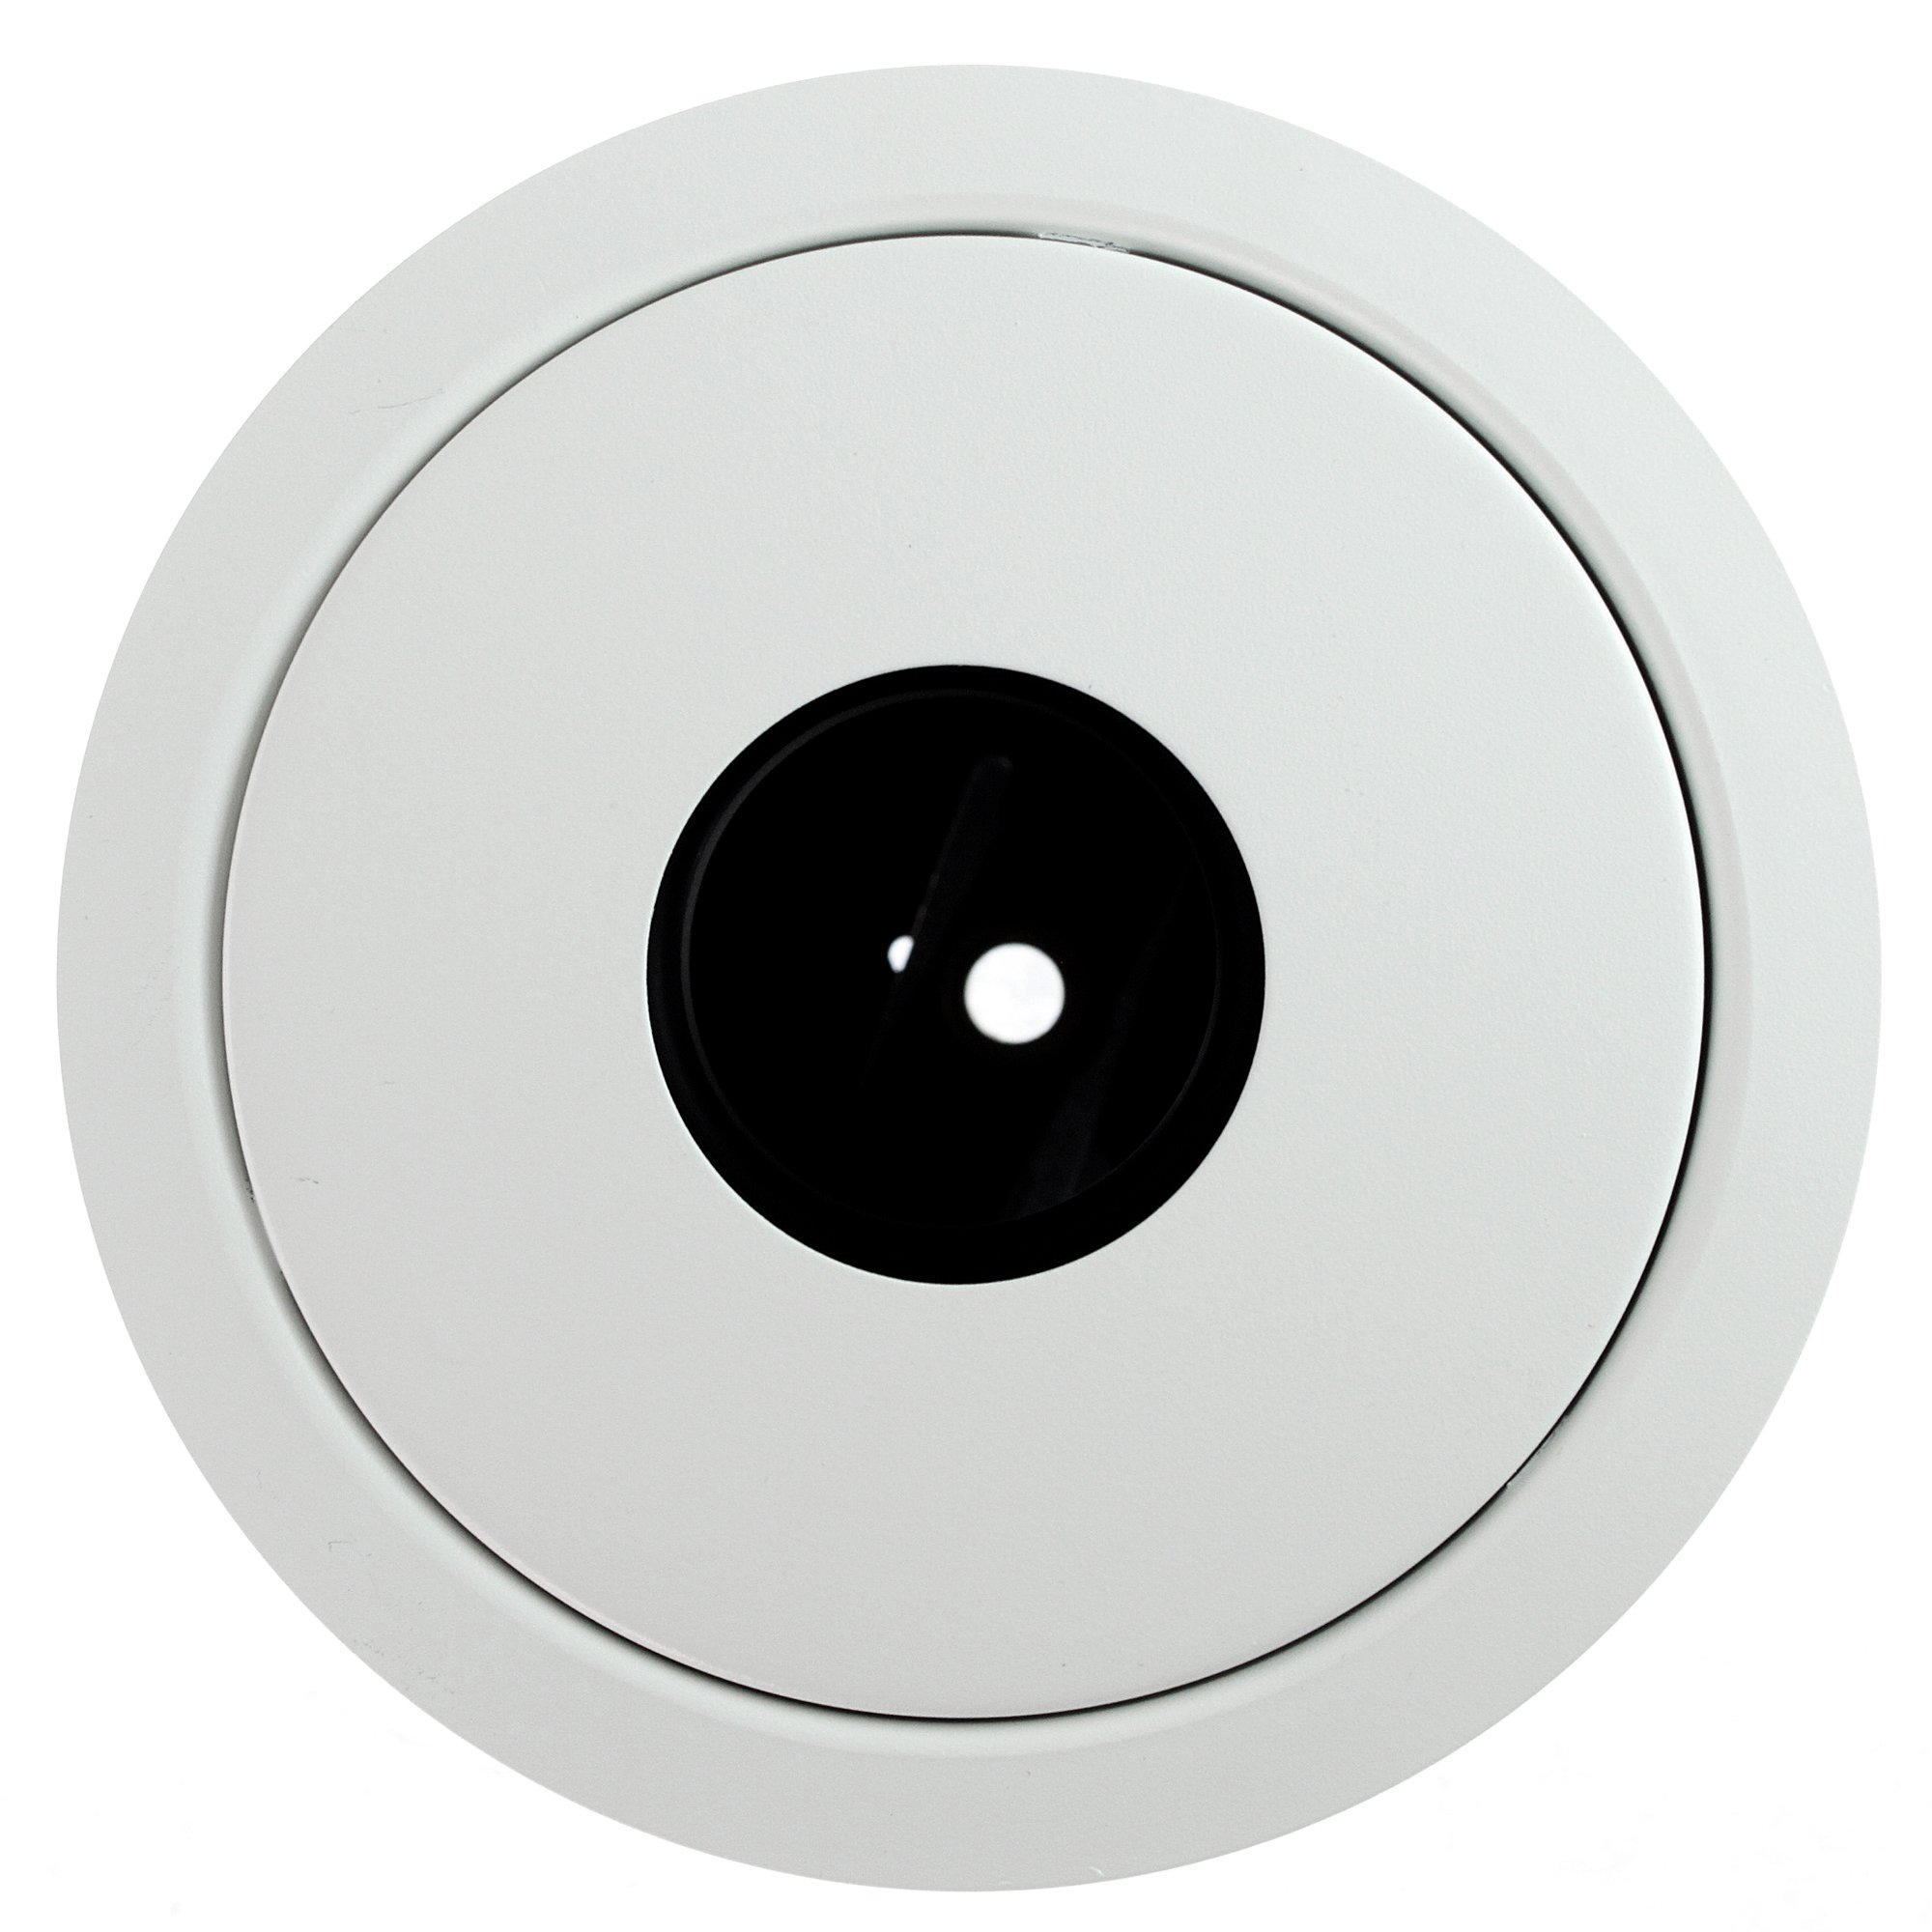 Lytecaster Adjustable MR16 Pinhole Reflector Trim in Matte White